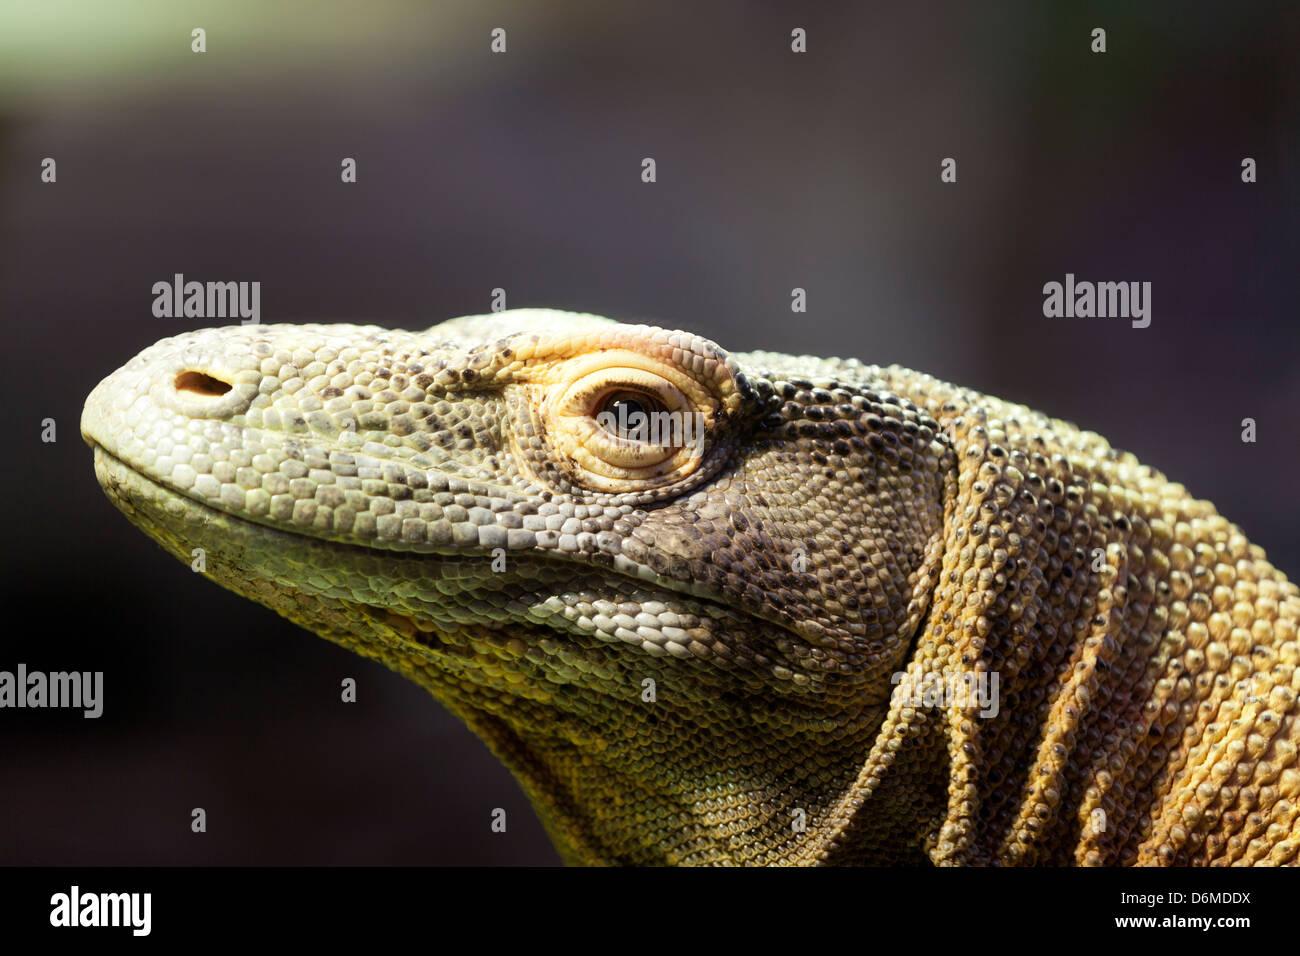 Komodo Dragon, Porträt eines Komodo Drachen. Stockfoto